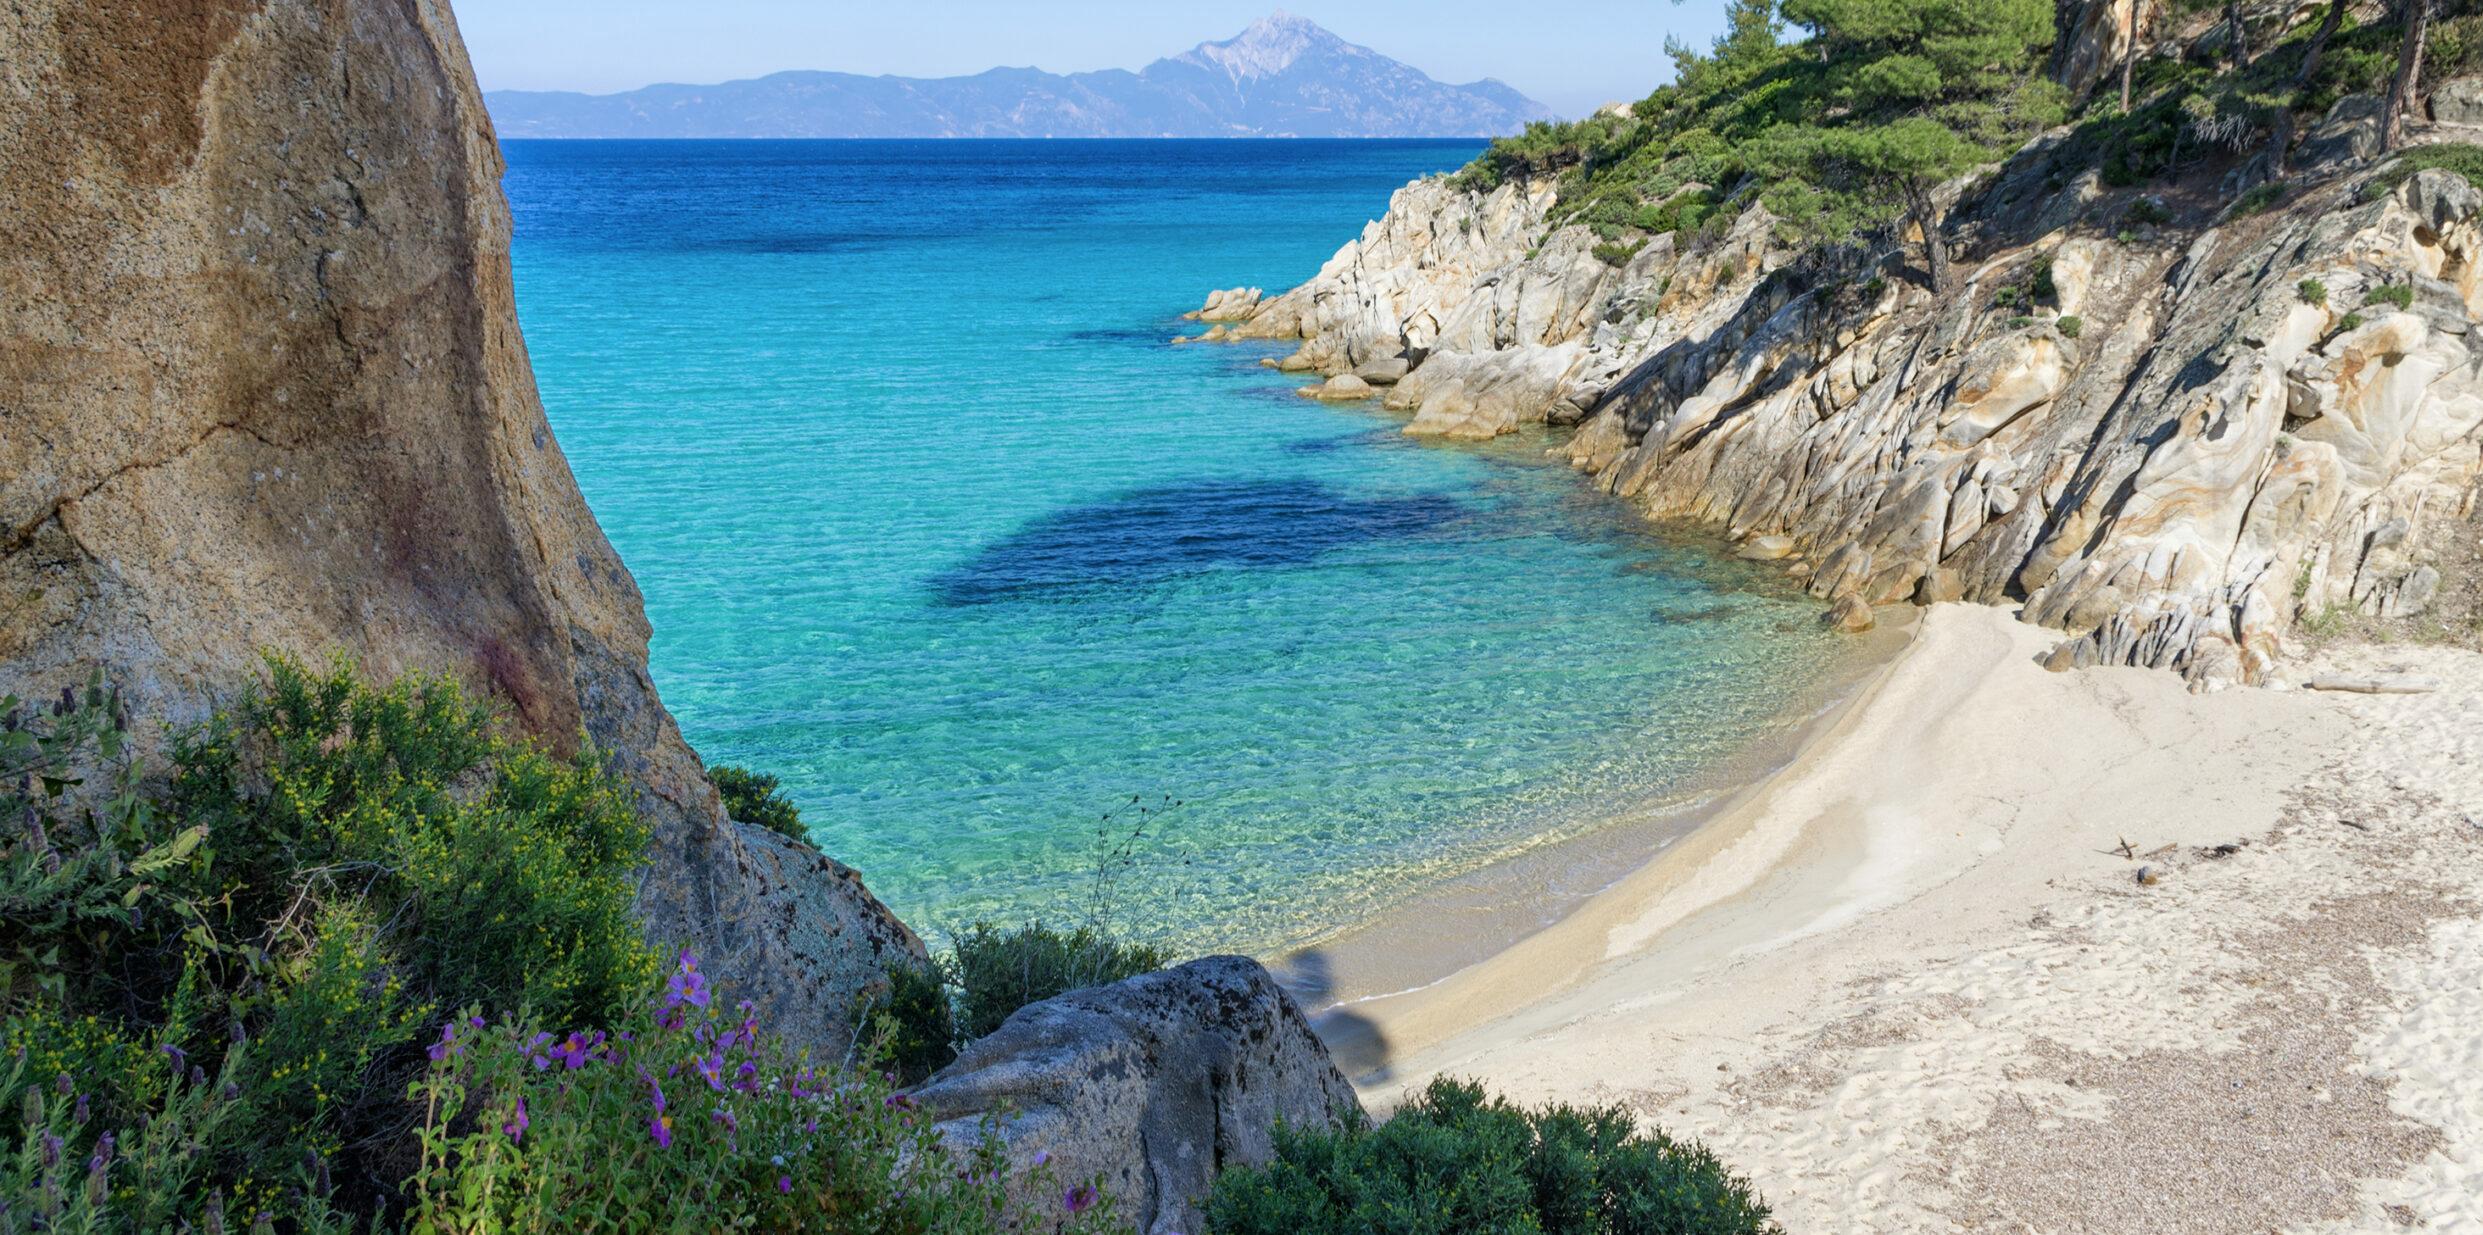 Halkidiki: The best beaches of Sithonia